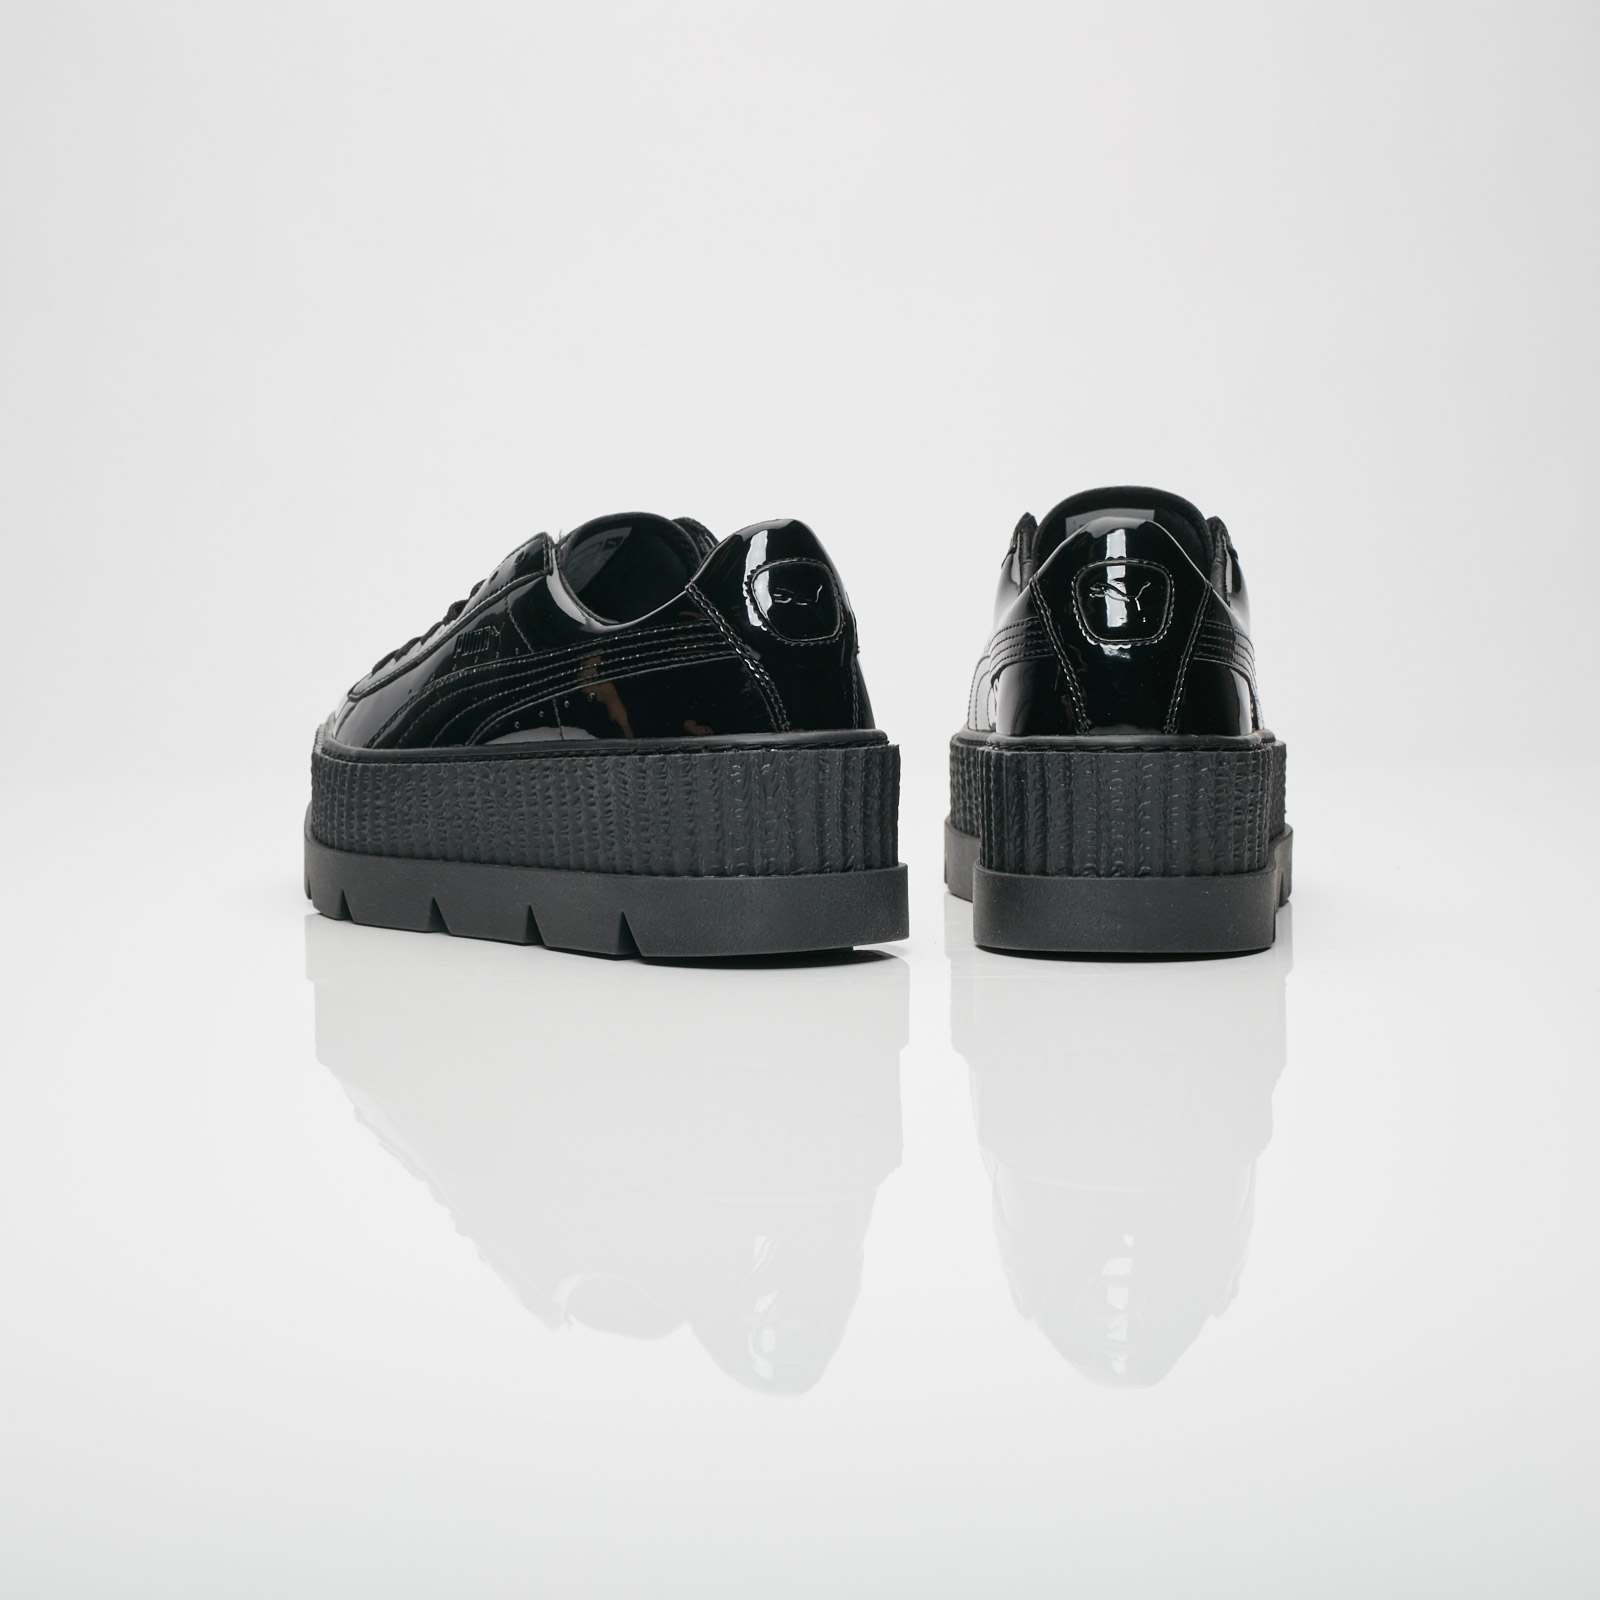 super popular 82eae 5f97b Puma Pointy Creeper Patent Wns - 366270-01 - Sneakersnstuff ...